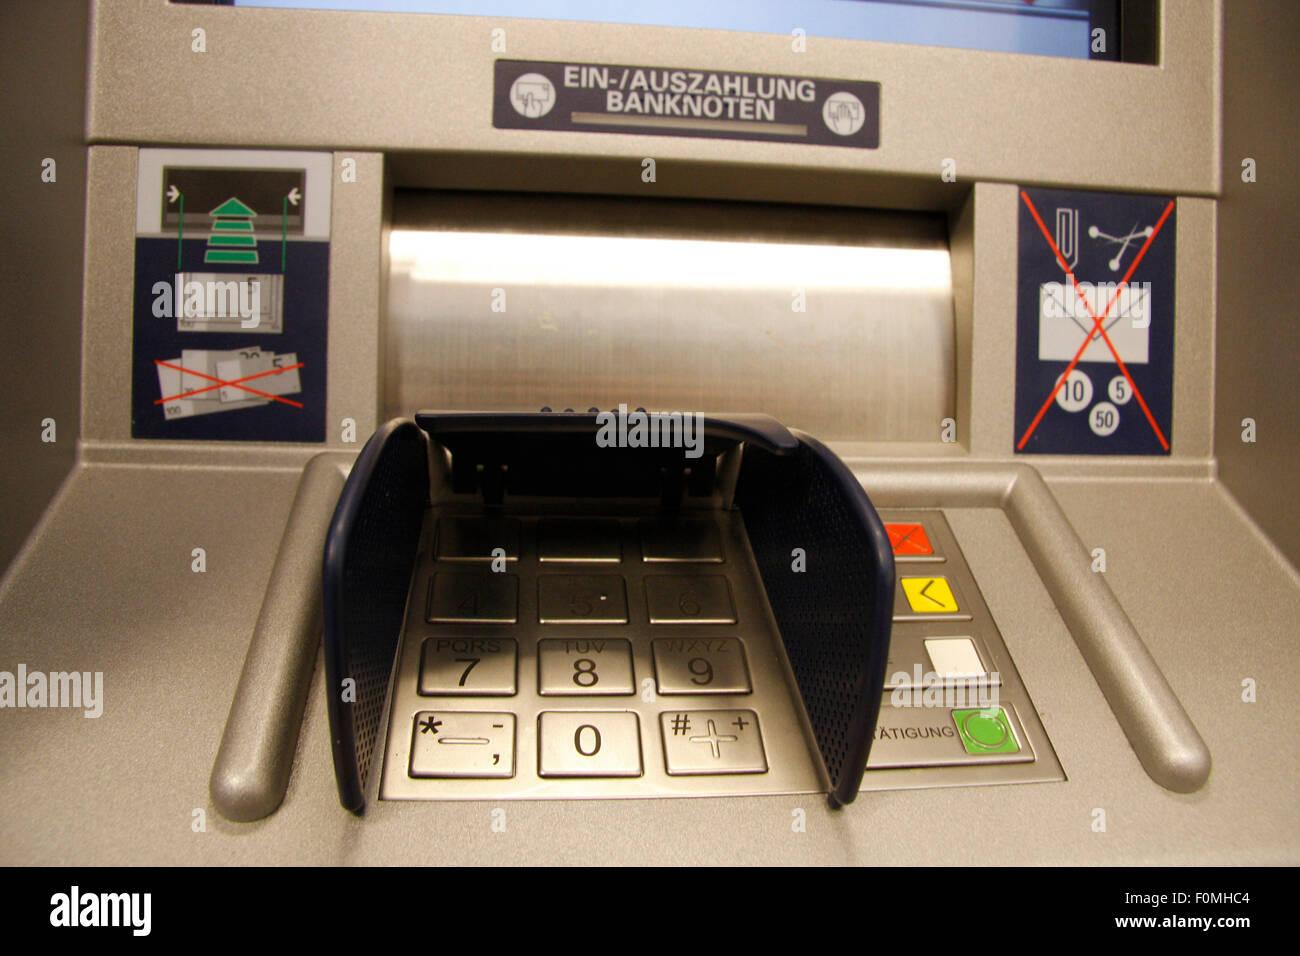 APRUIL 2008 - BERLIN: an Automatic Teller Machine (ATM) in a bank in Berlin. - Stock Image